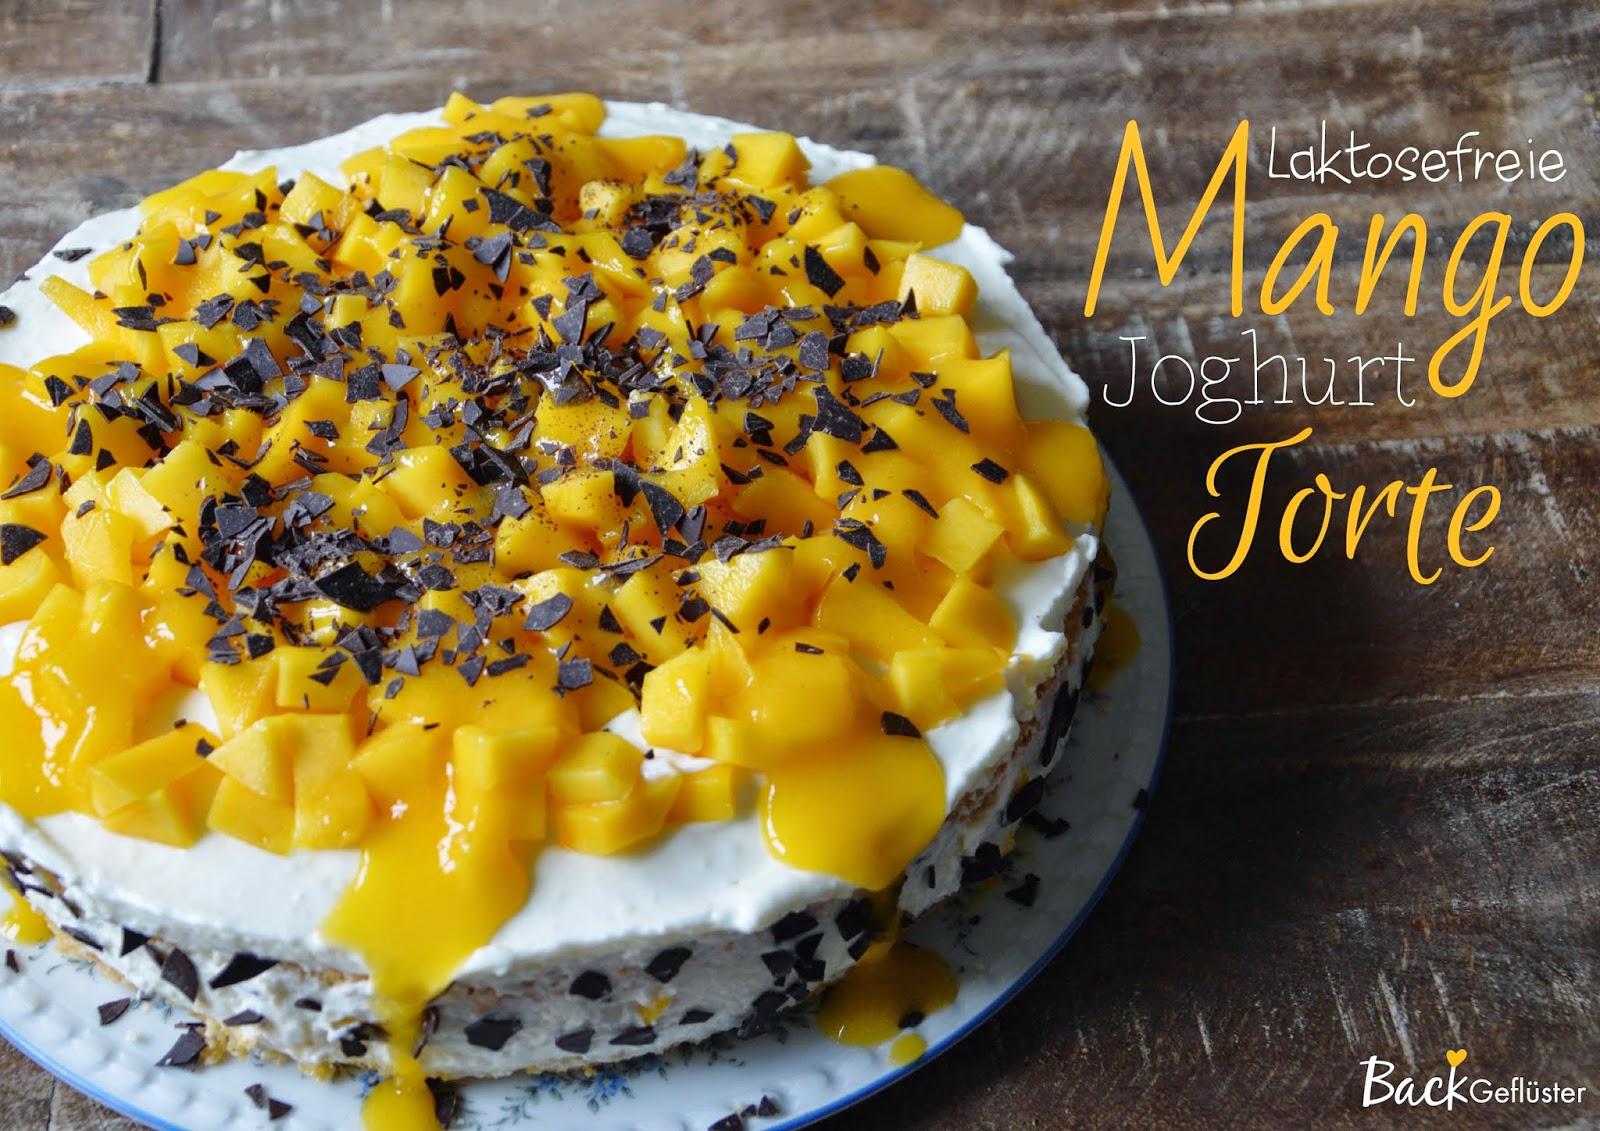 Backgefluster Mango Joghurt Torte Laktosefrei